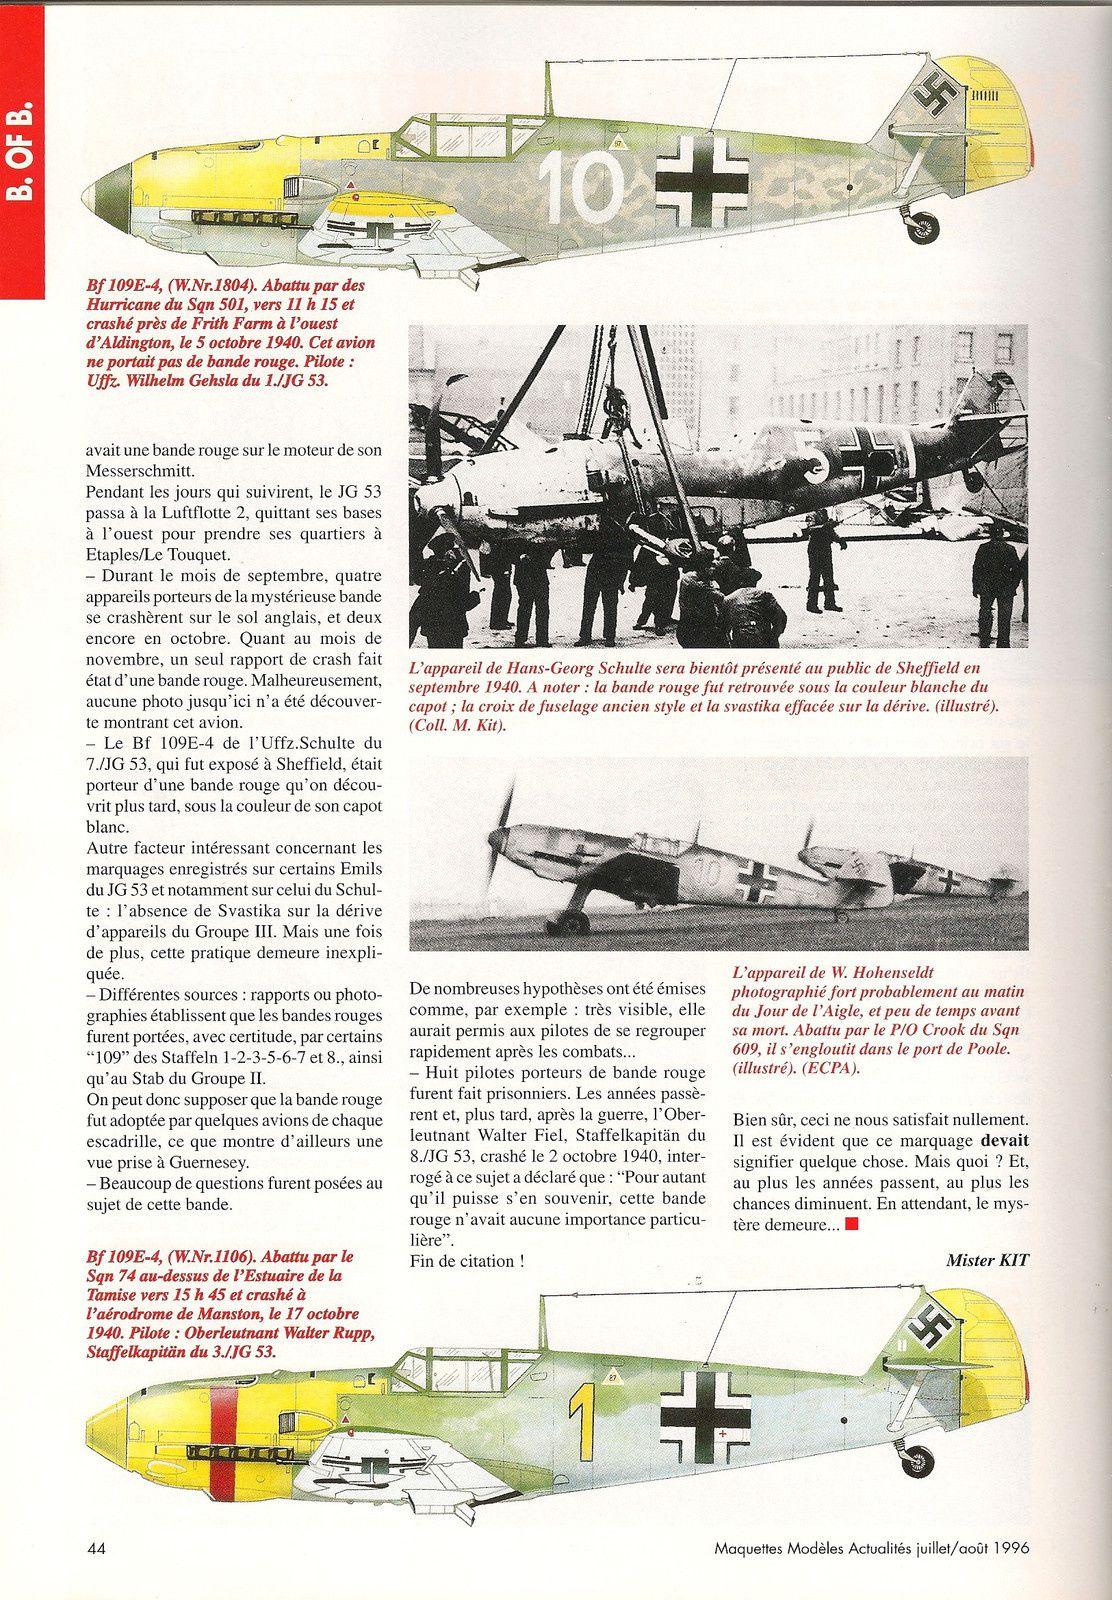 la Bataille d'Angleterre   la Mystérieuse bande rouge  du JG 53